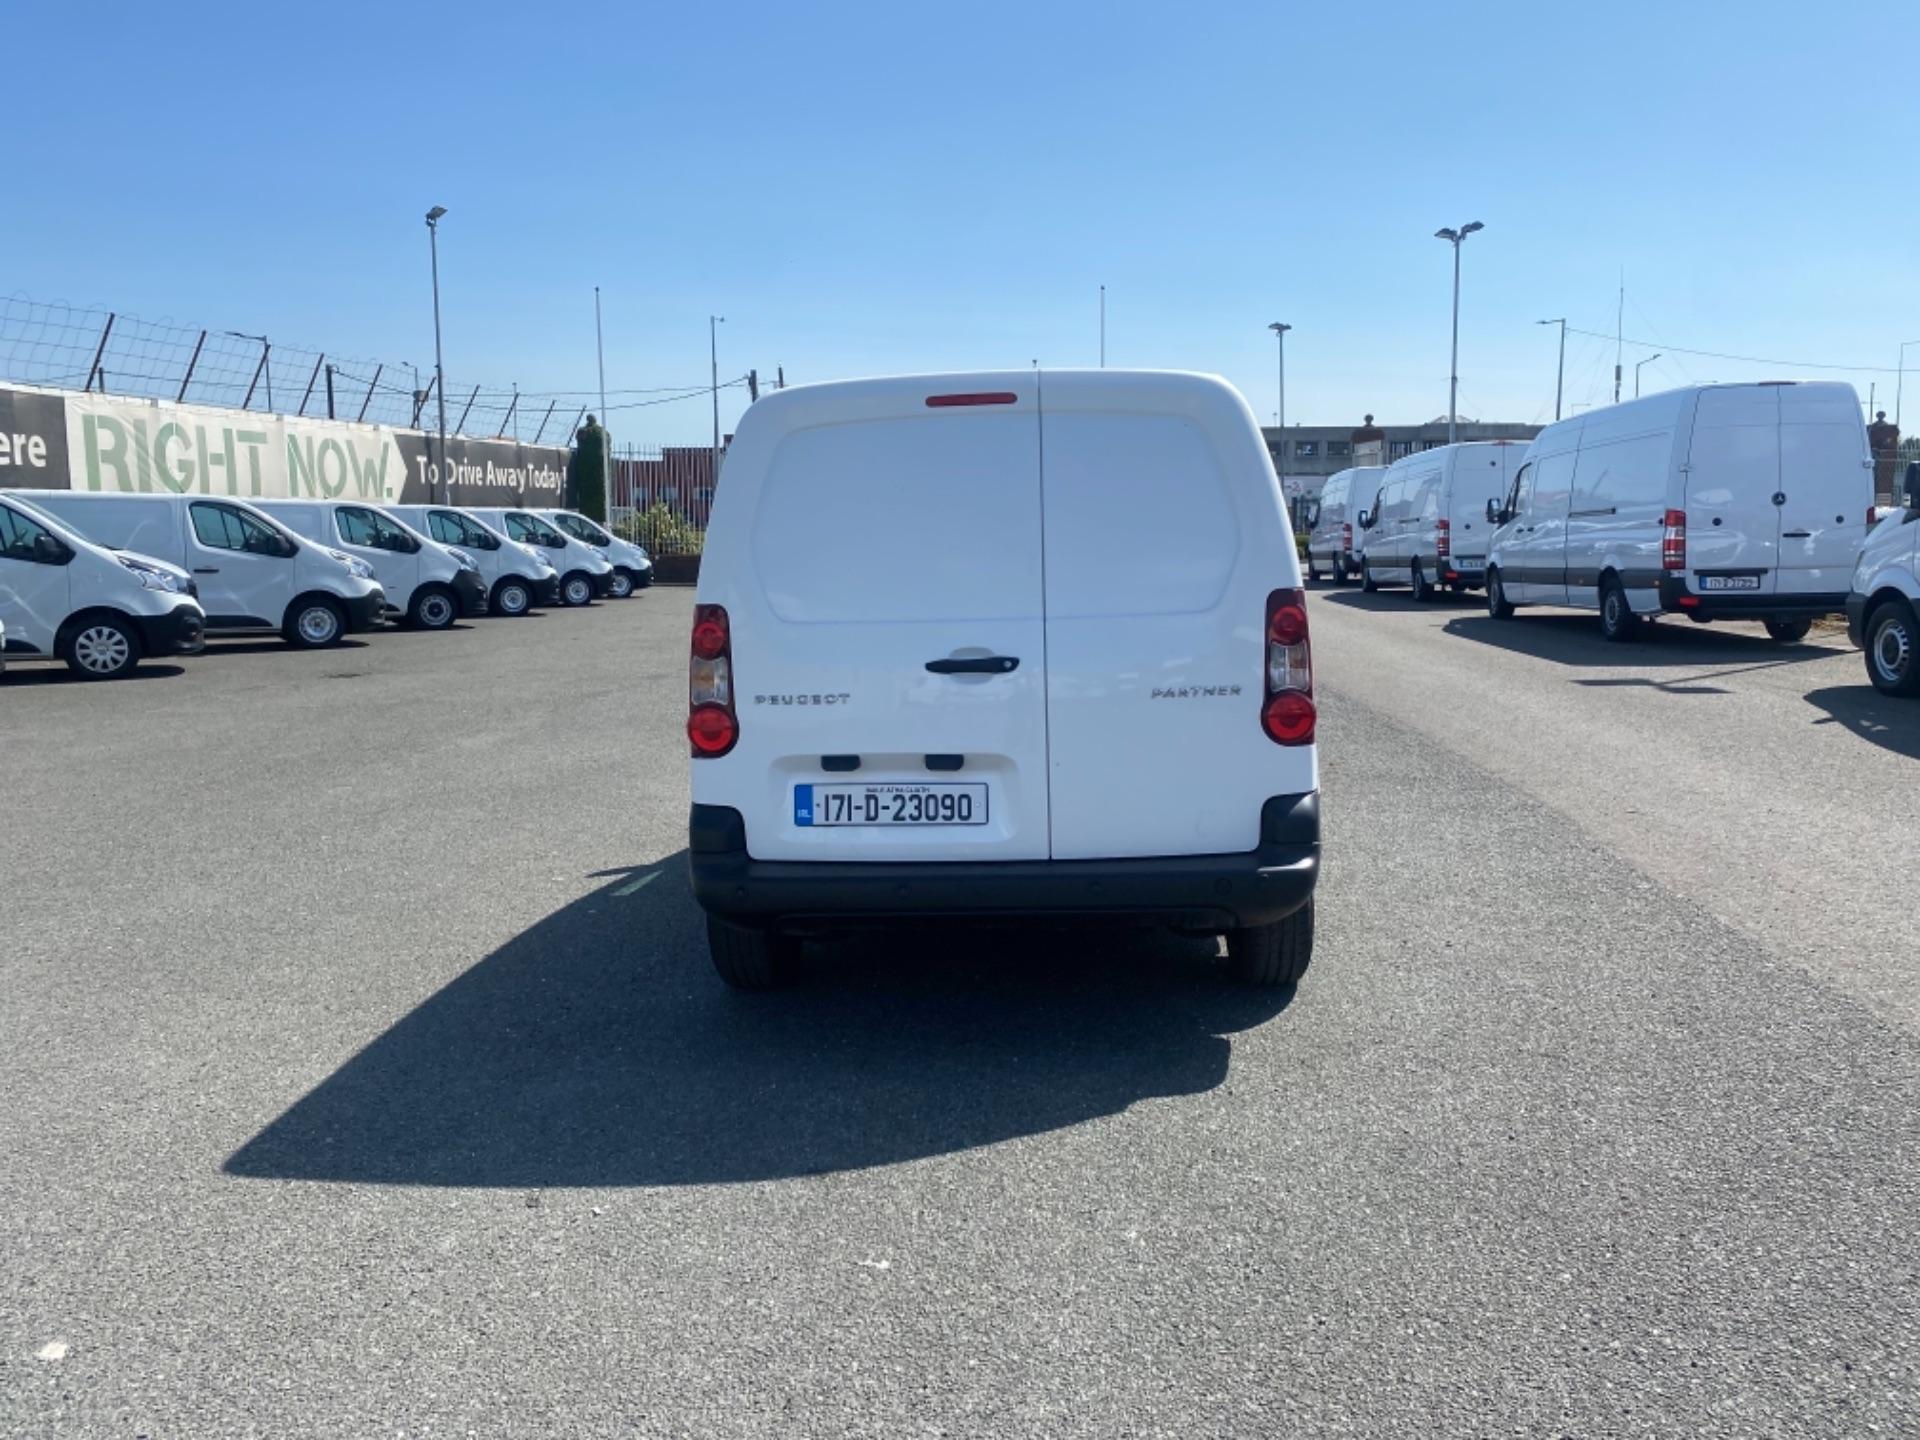 2017 Peugeot Partner Professional 1.6 Blue HDI 100 (171D23090) Image 5